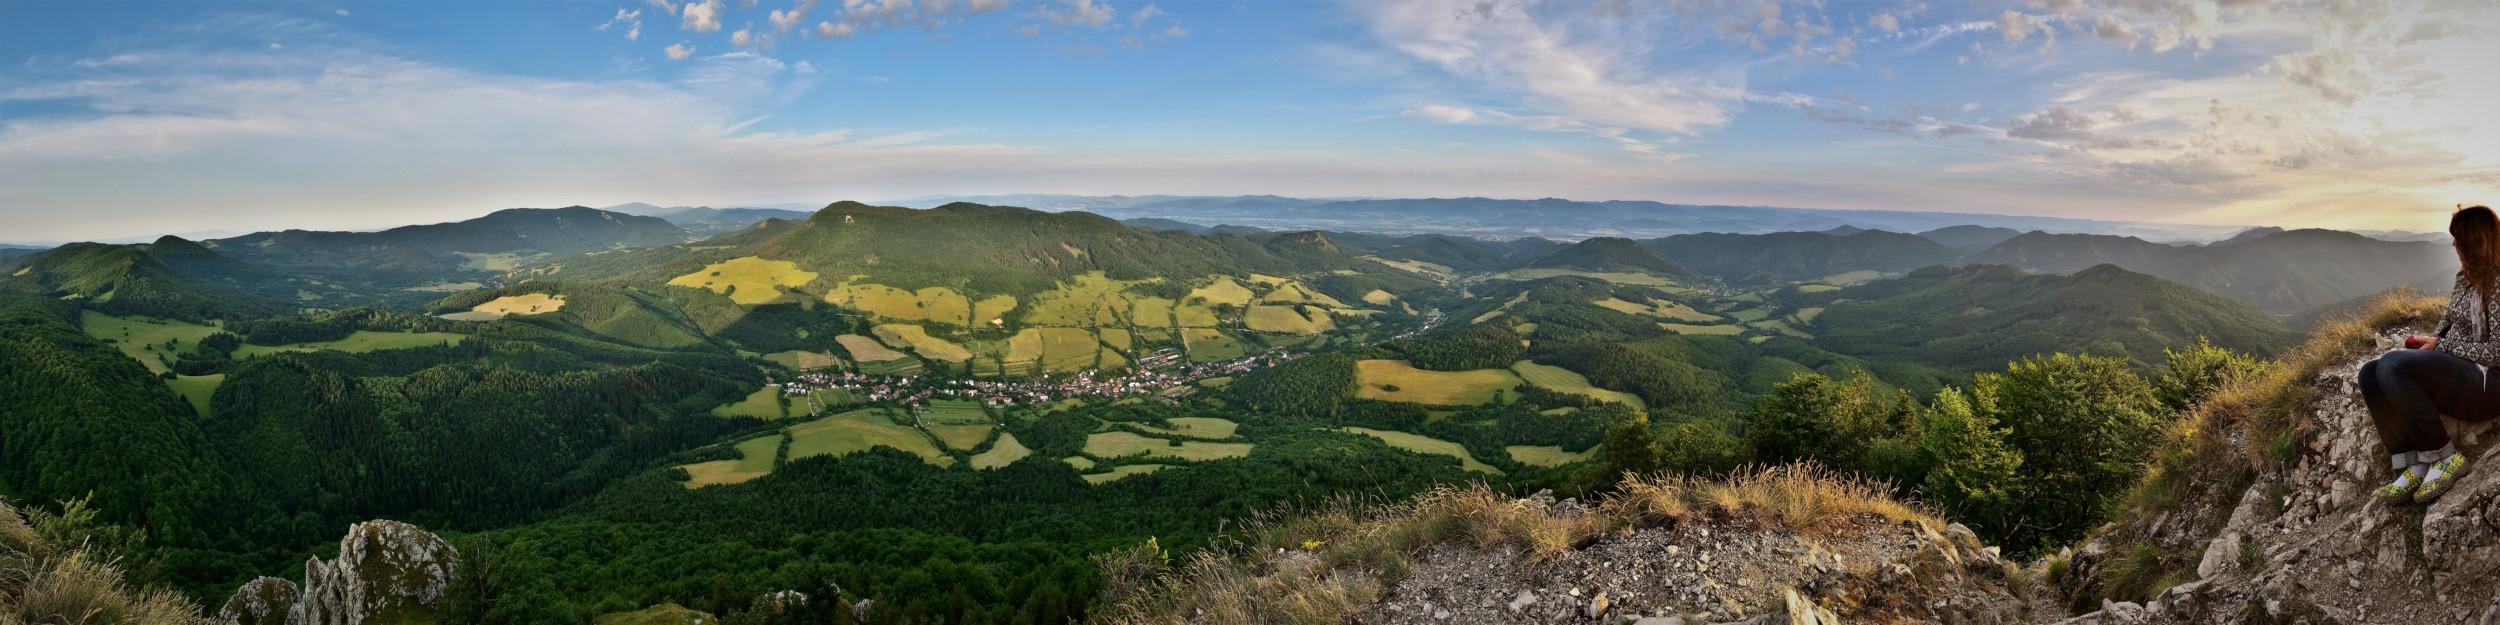 Vápeč Slovensko